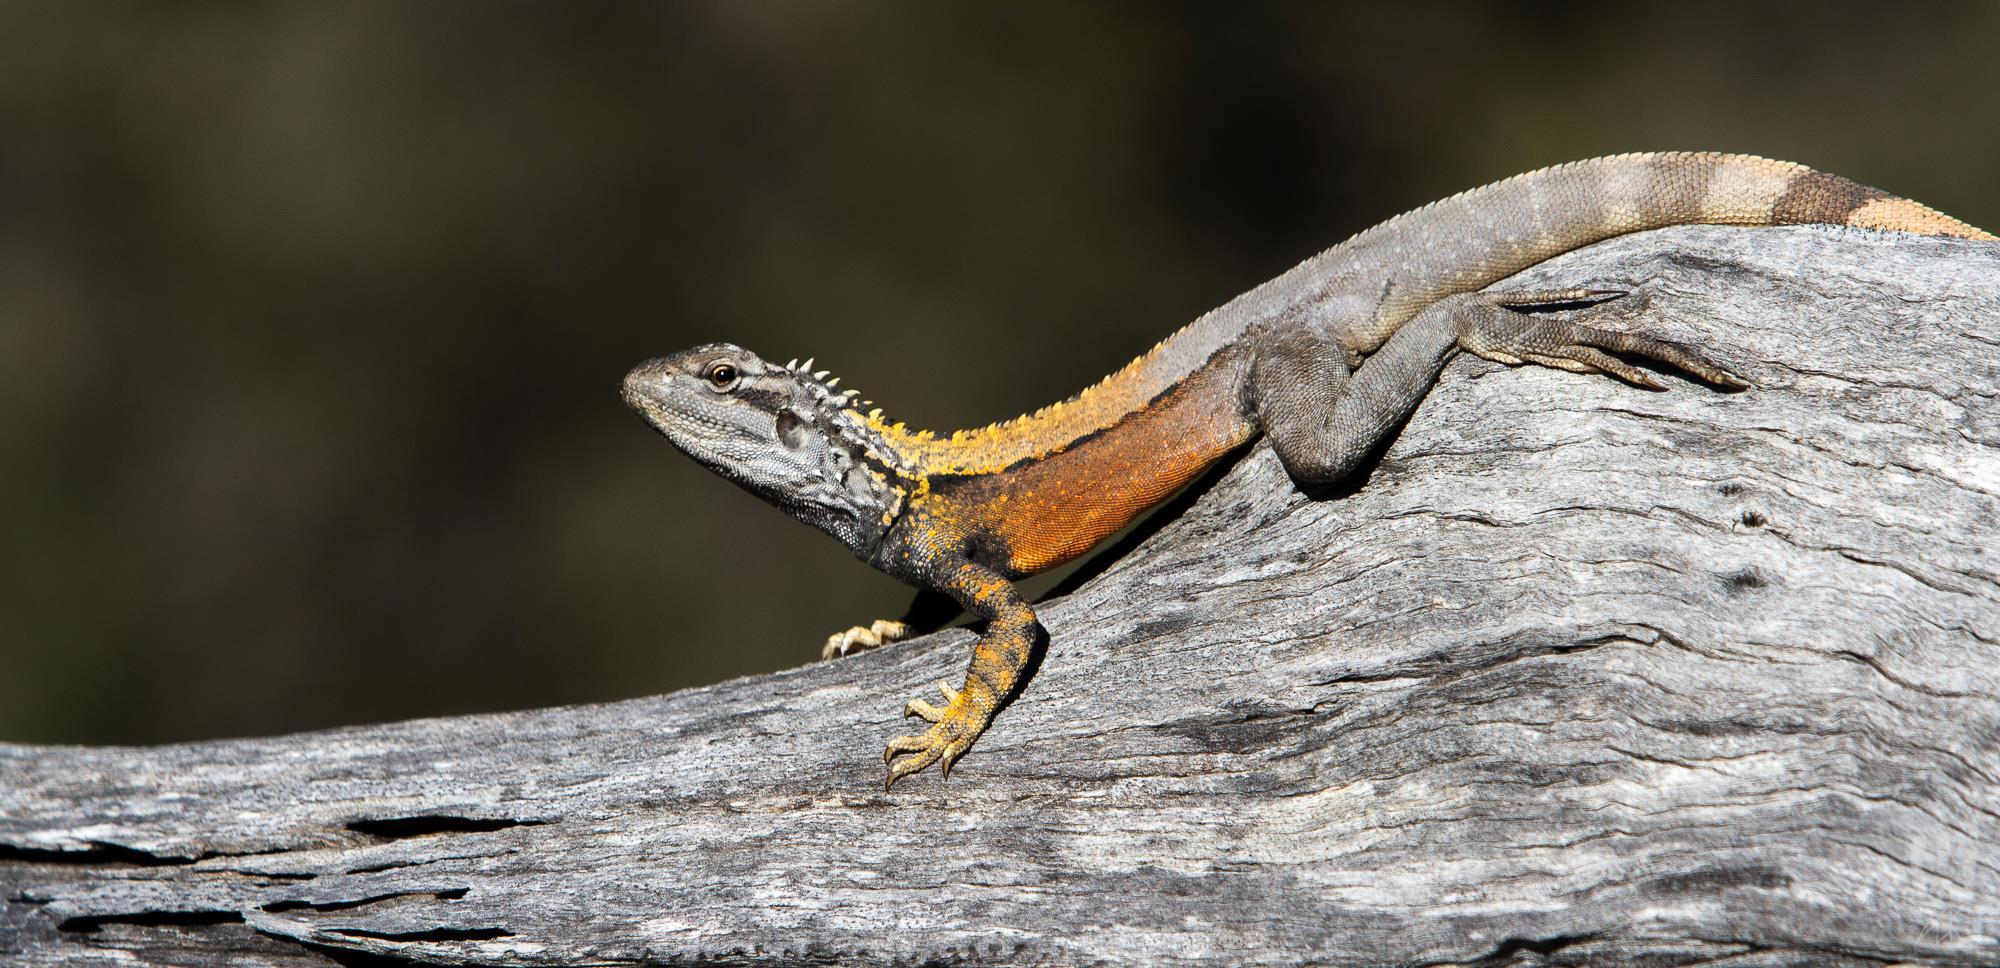 Male bicycle dragon, Ctenophorus cristatus. Lake Hurlestone Conservation Reserve, Western Australia, 2013. Photo by Angus Kennedy.